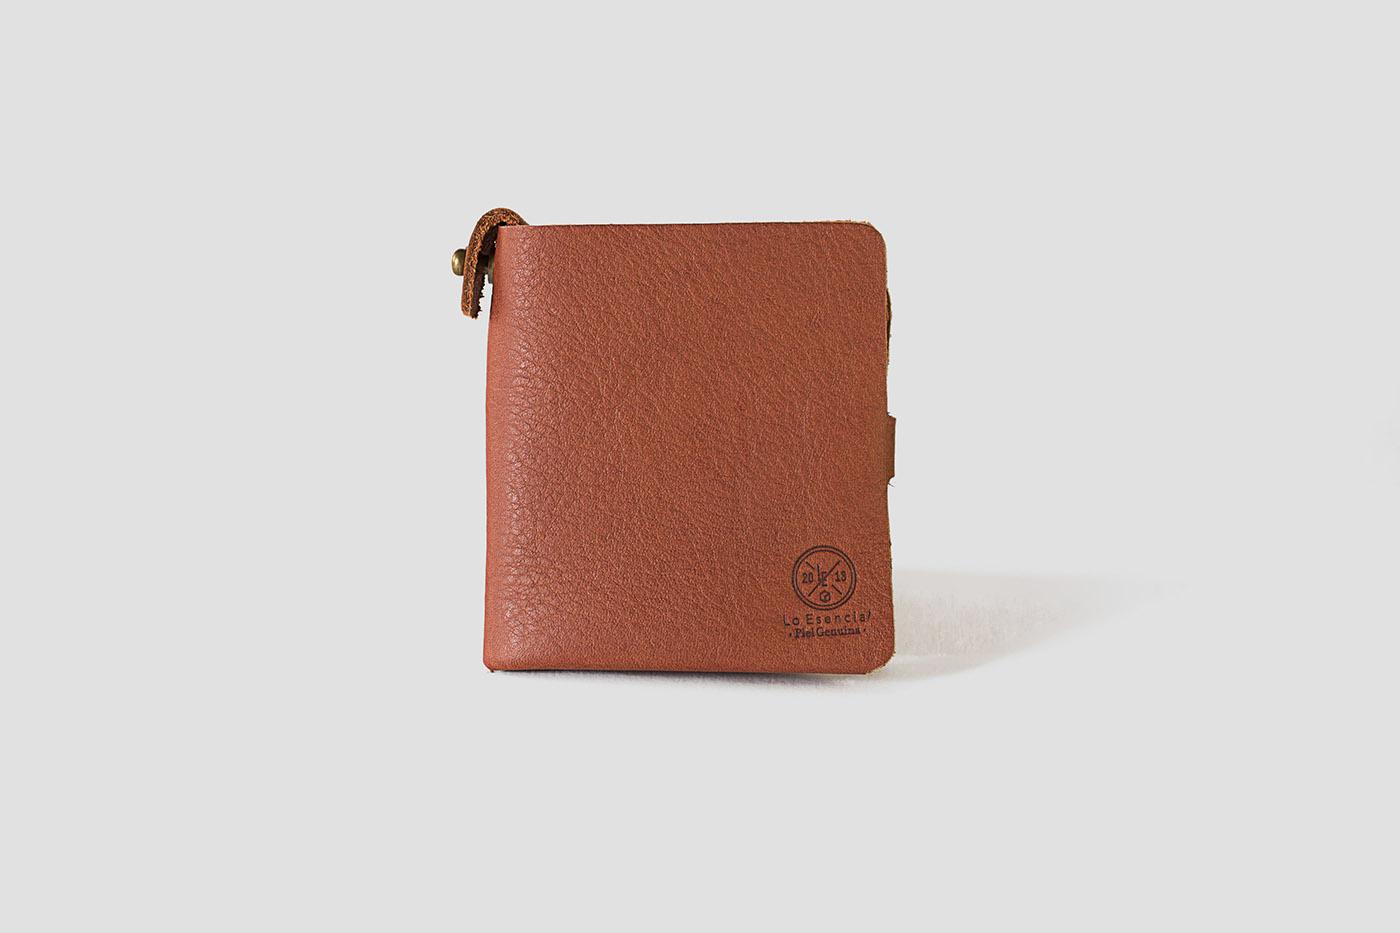 WALLET leather seamless mexico mexicandesign leathergoods loesencial adolfo navarro Mexican unibody cardholder lo esencial